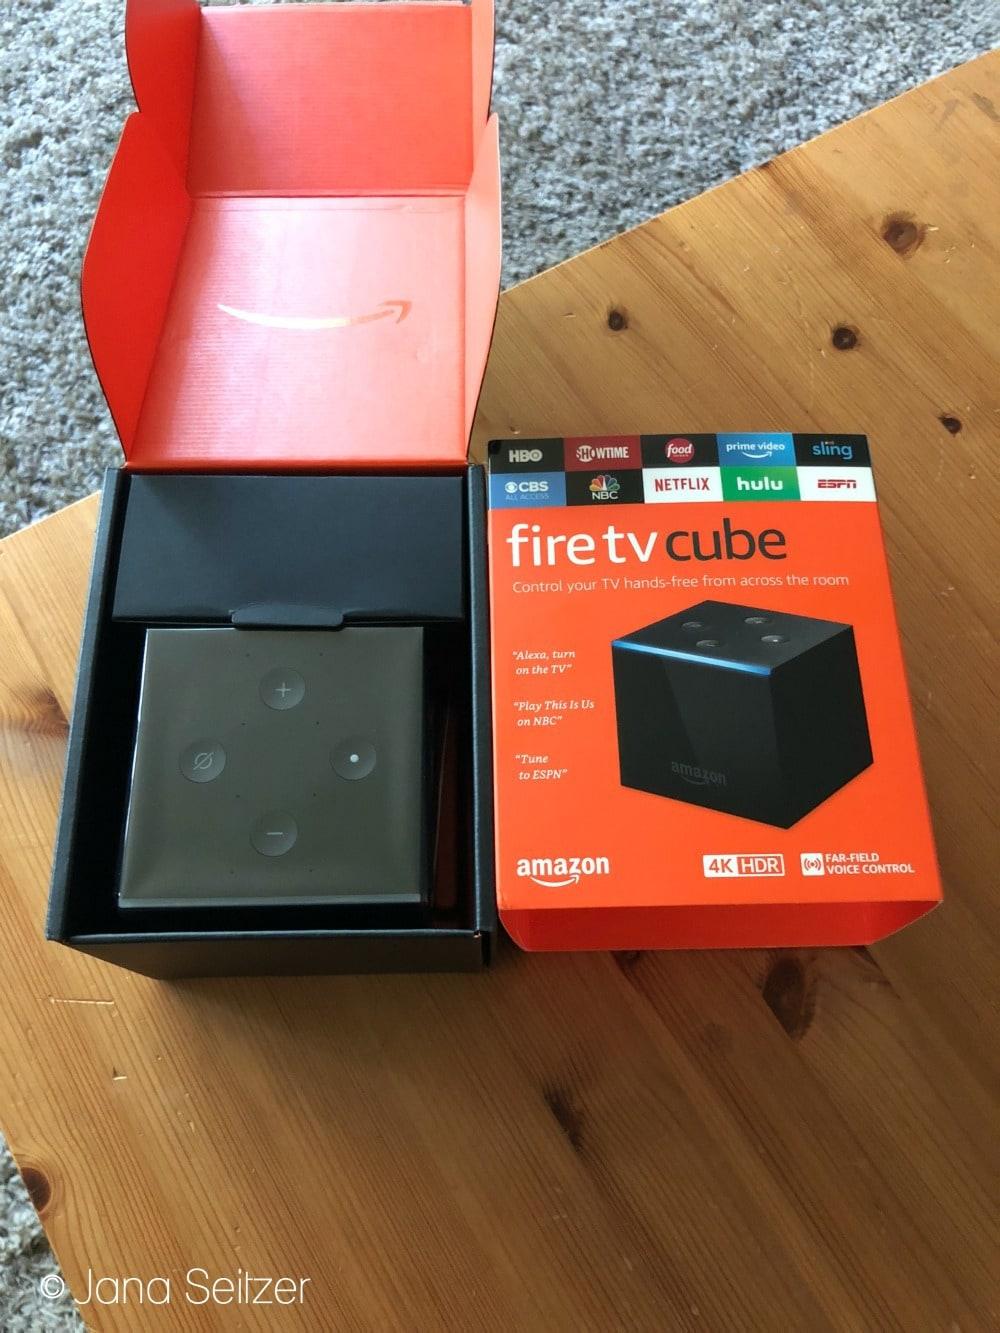 Amazon Fire TV Cube for simple entertainment integration - box